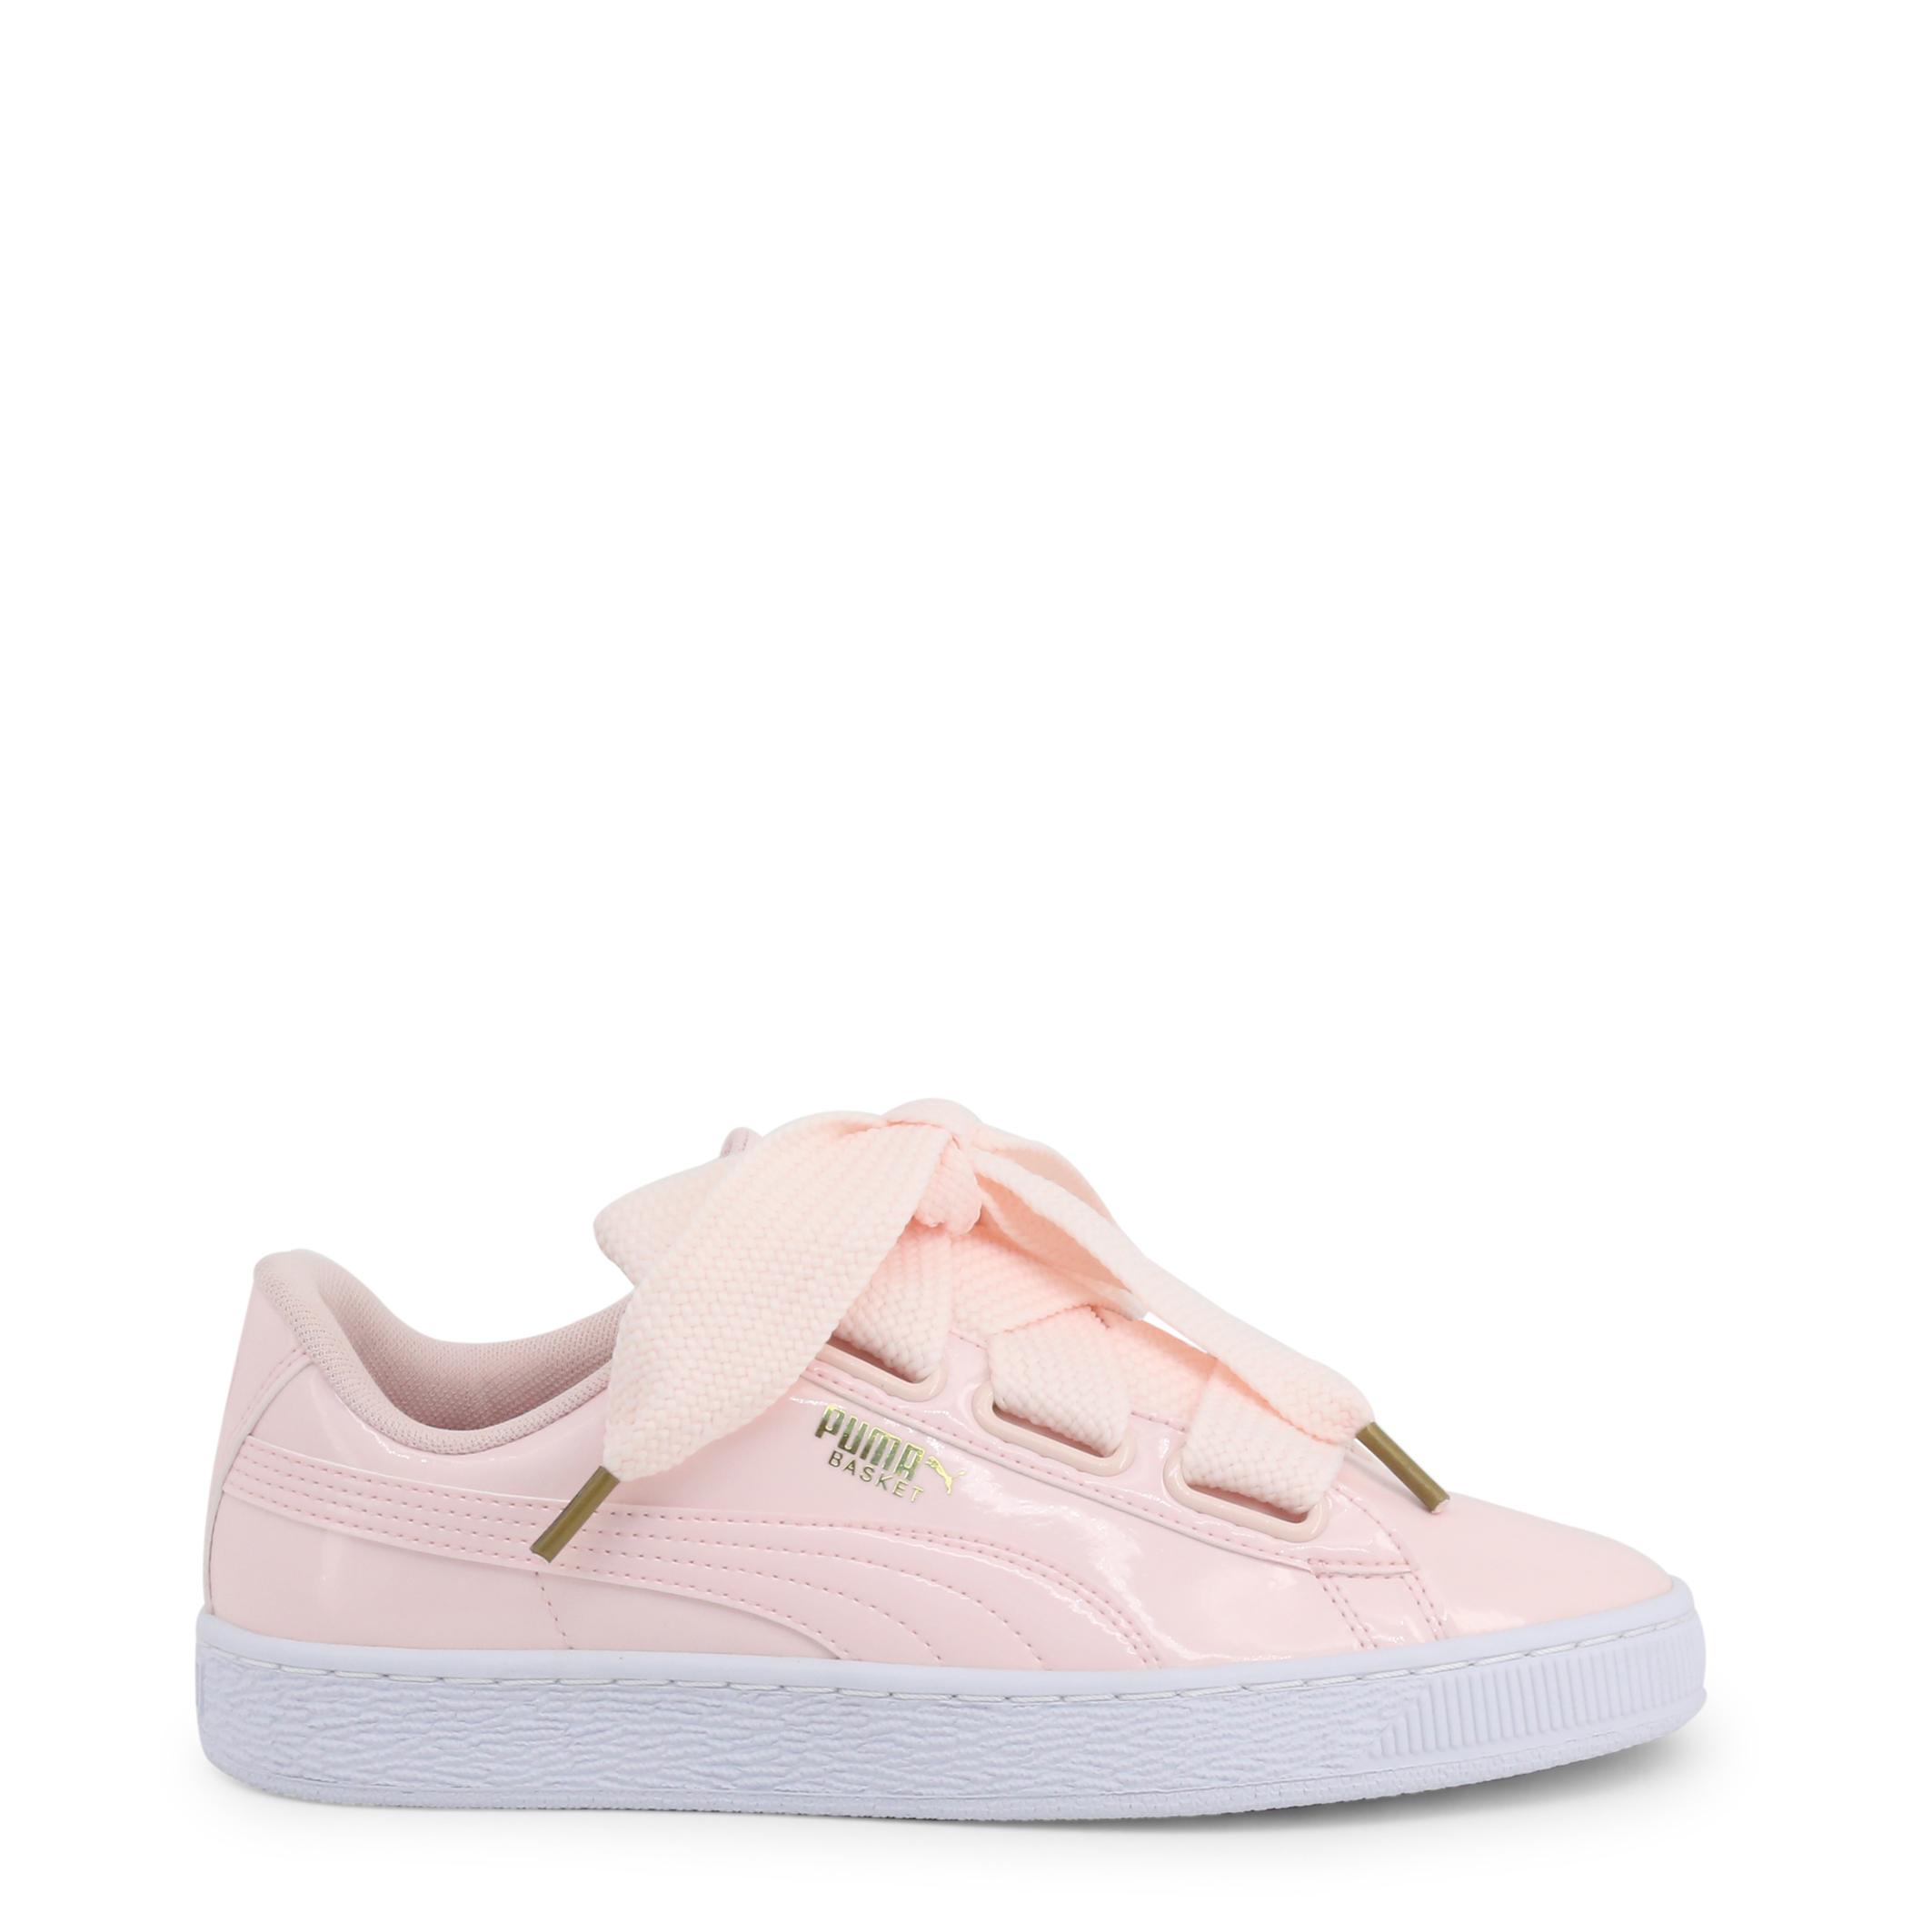 Scarpe-Puma-Donna-363073-BasketHeartPatent-Sneakers-Rosa-Bianco